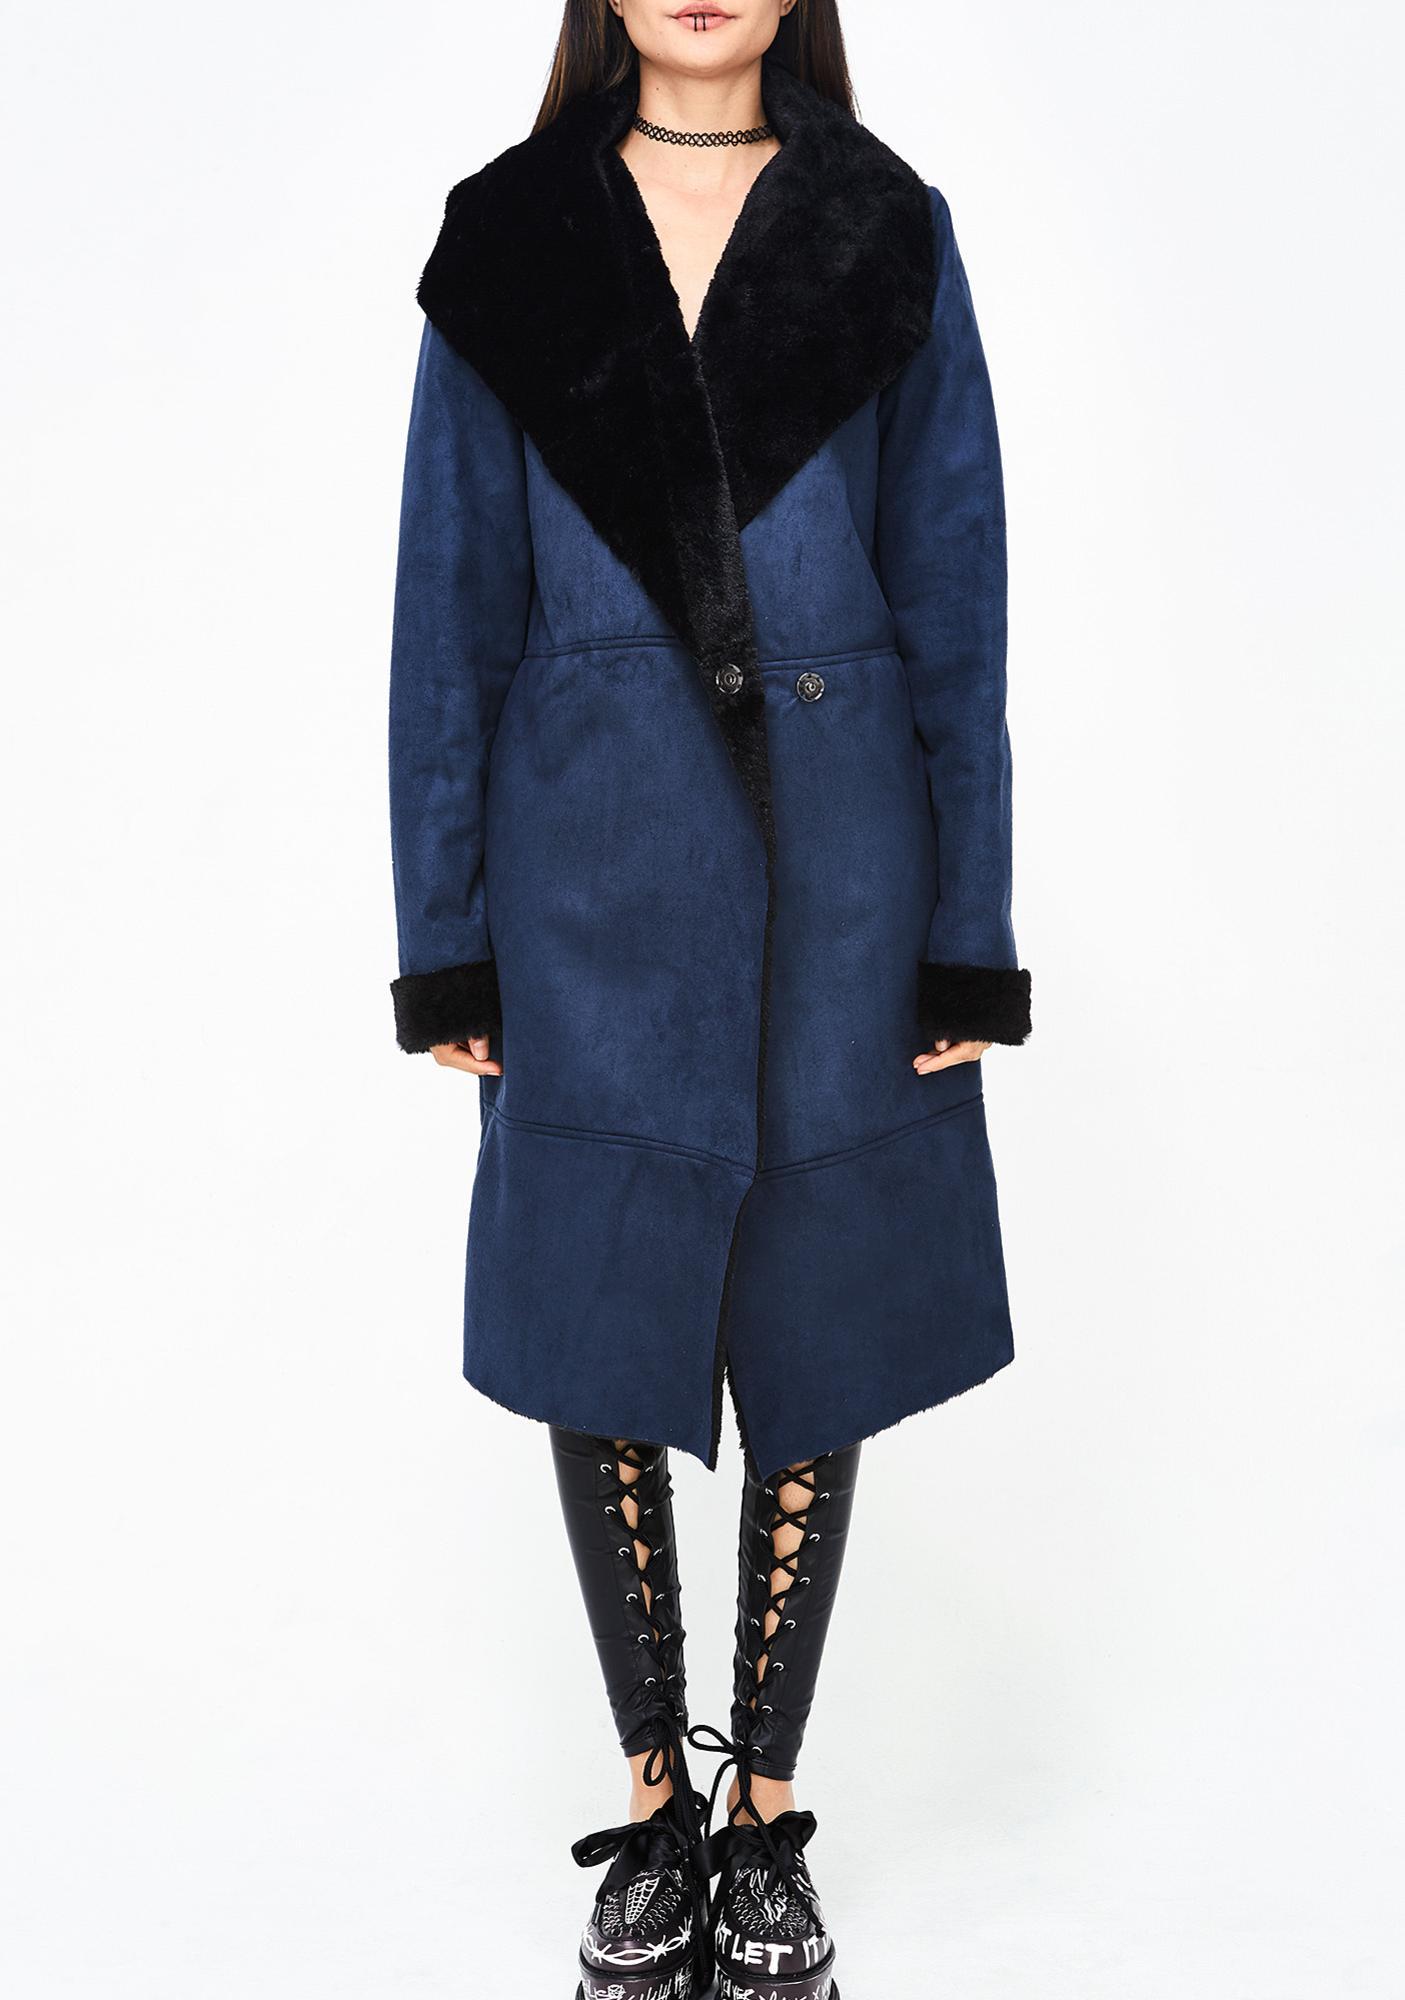 Not So Shearling Coat